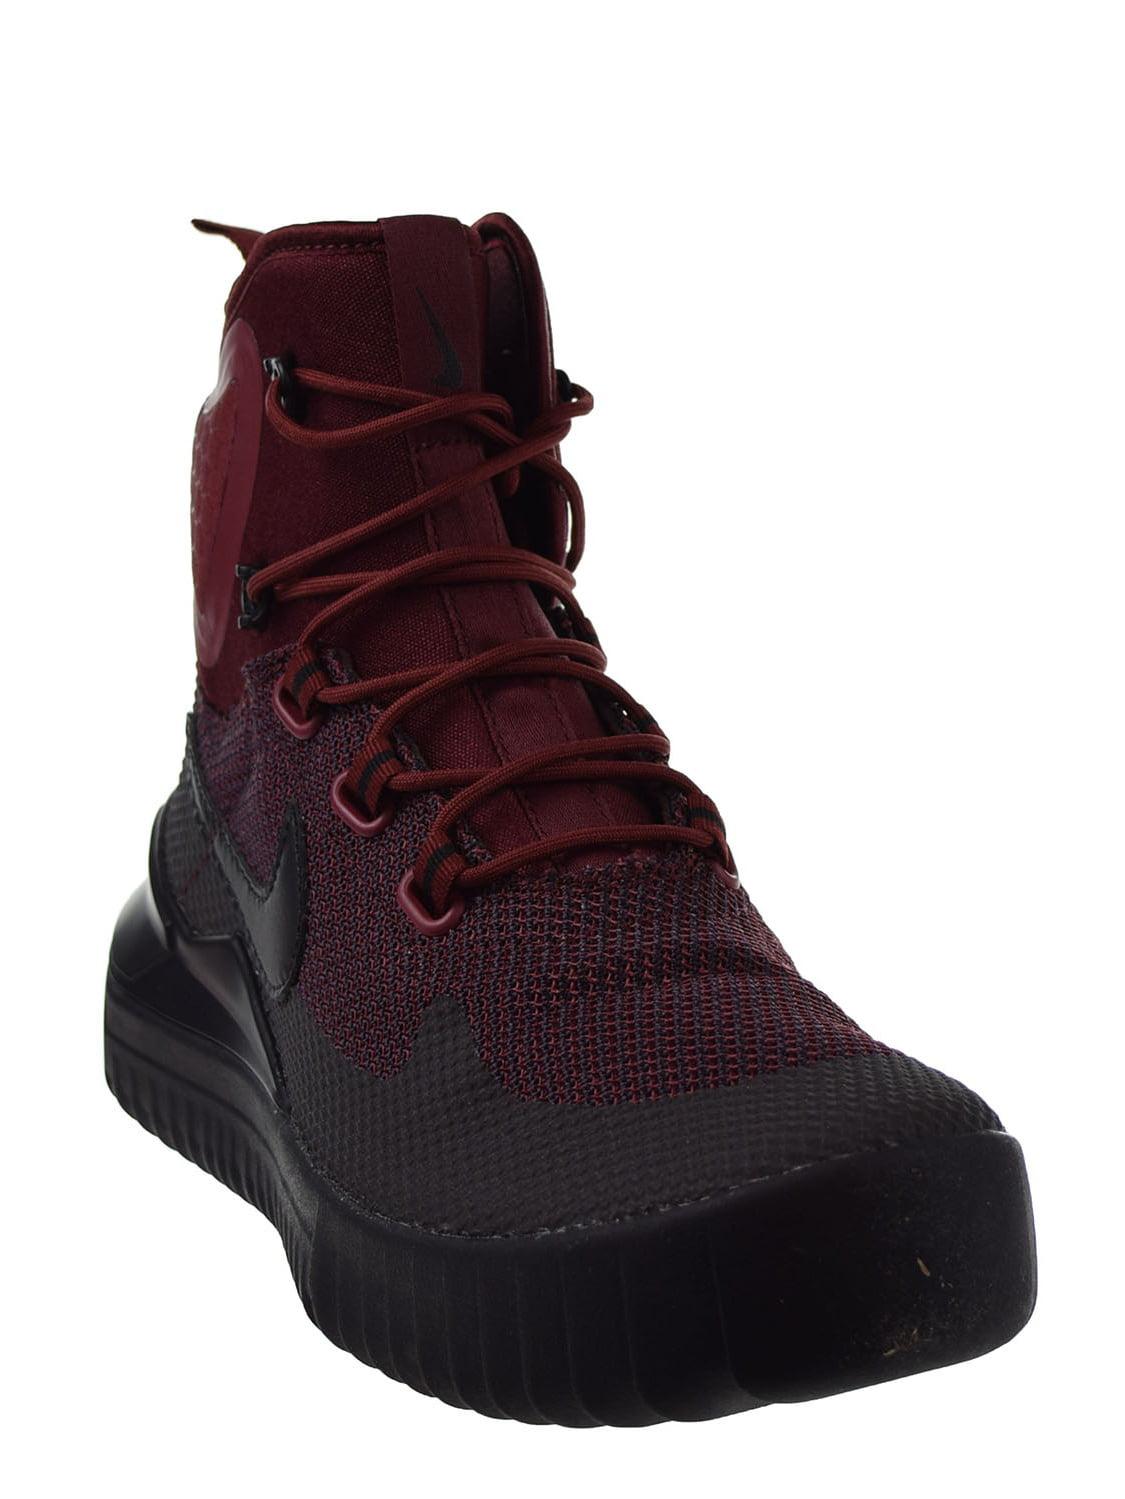 Nike Air Wild Mid Men's Shoes Dark Team Red/Port Wine/Black 916819-600